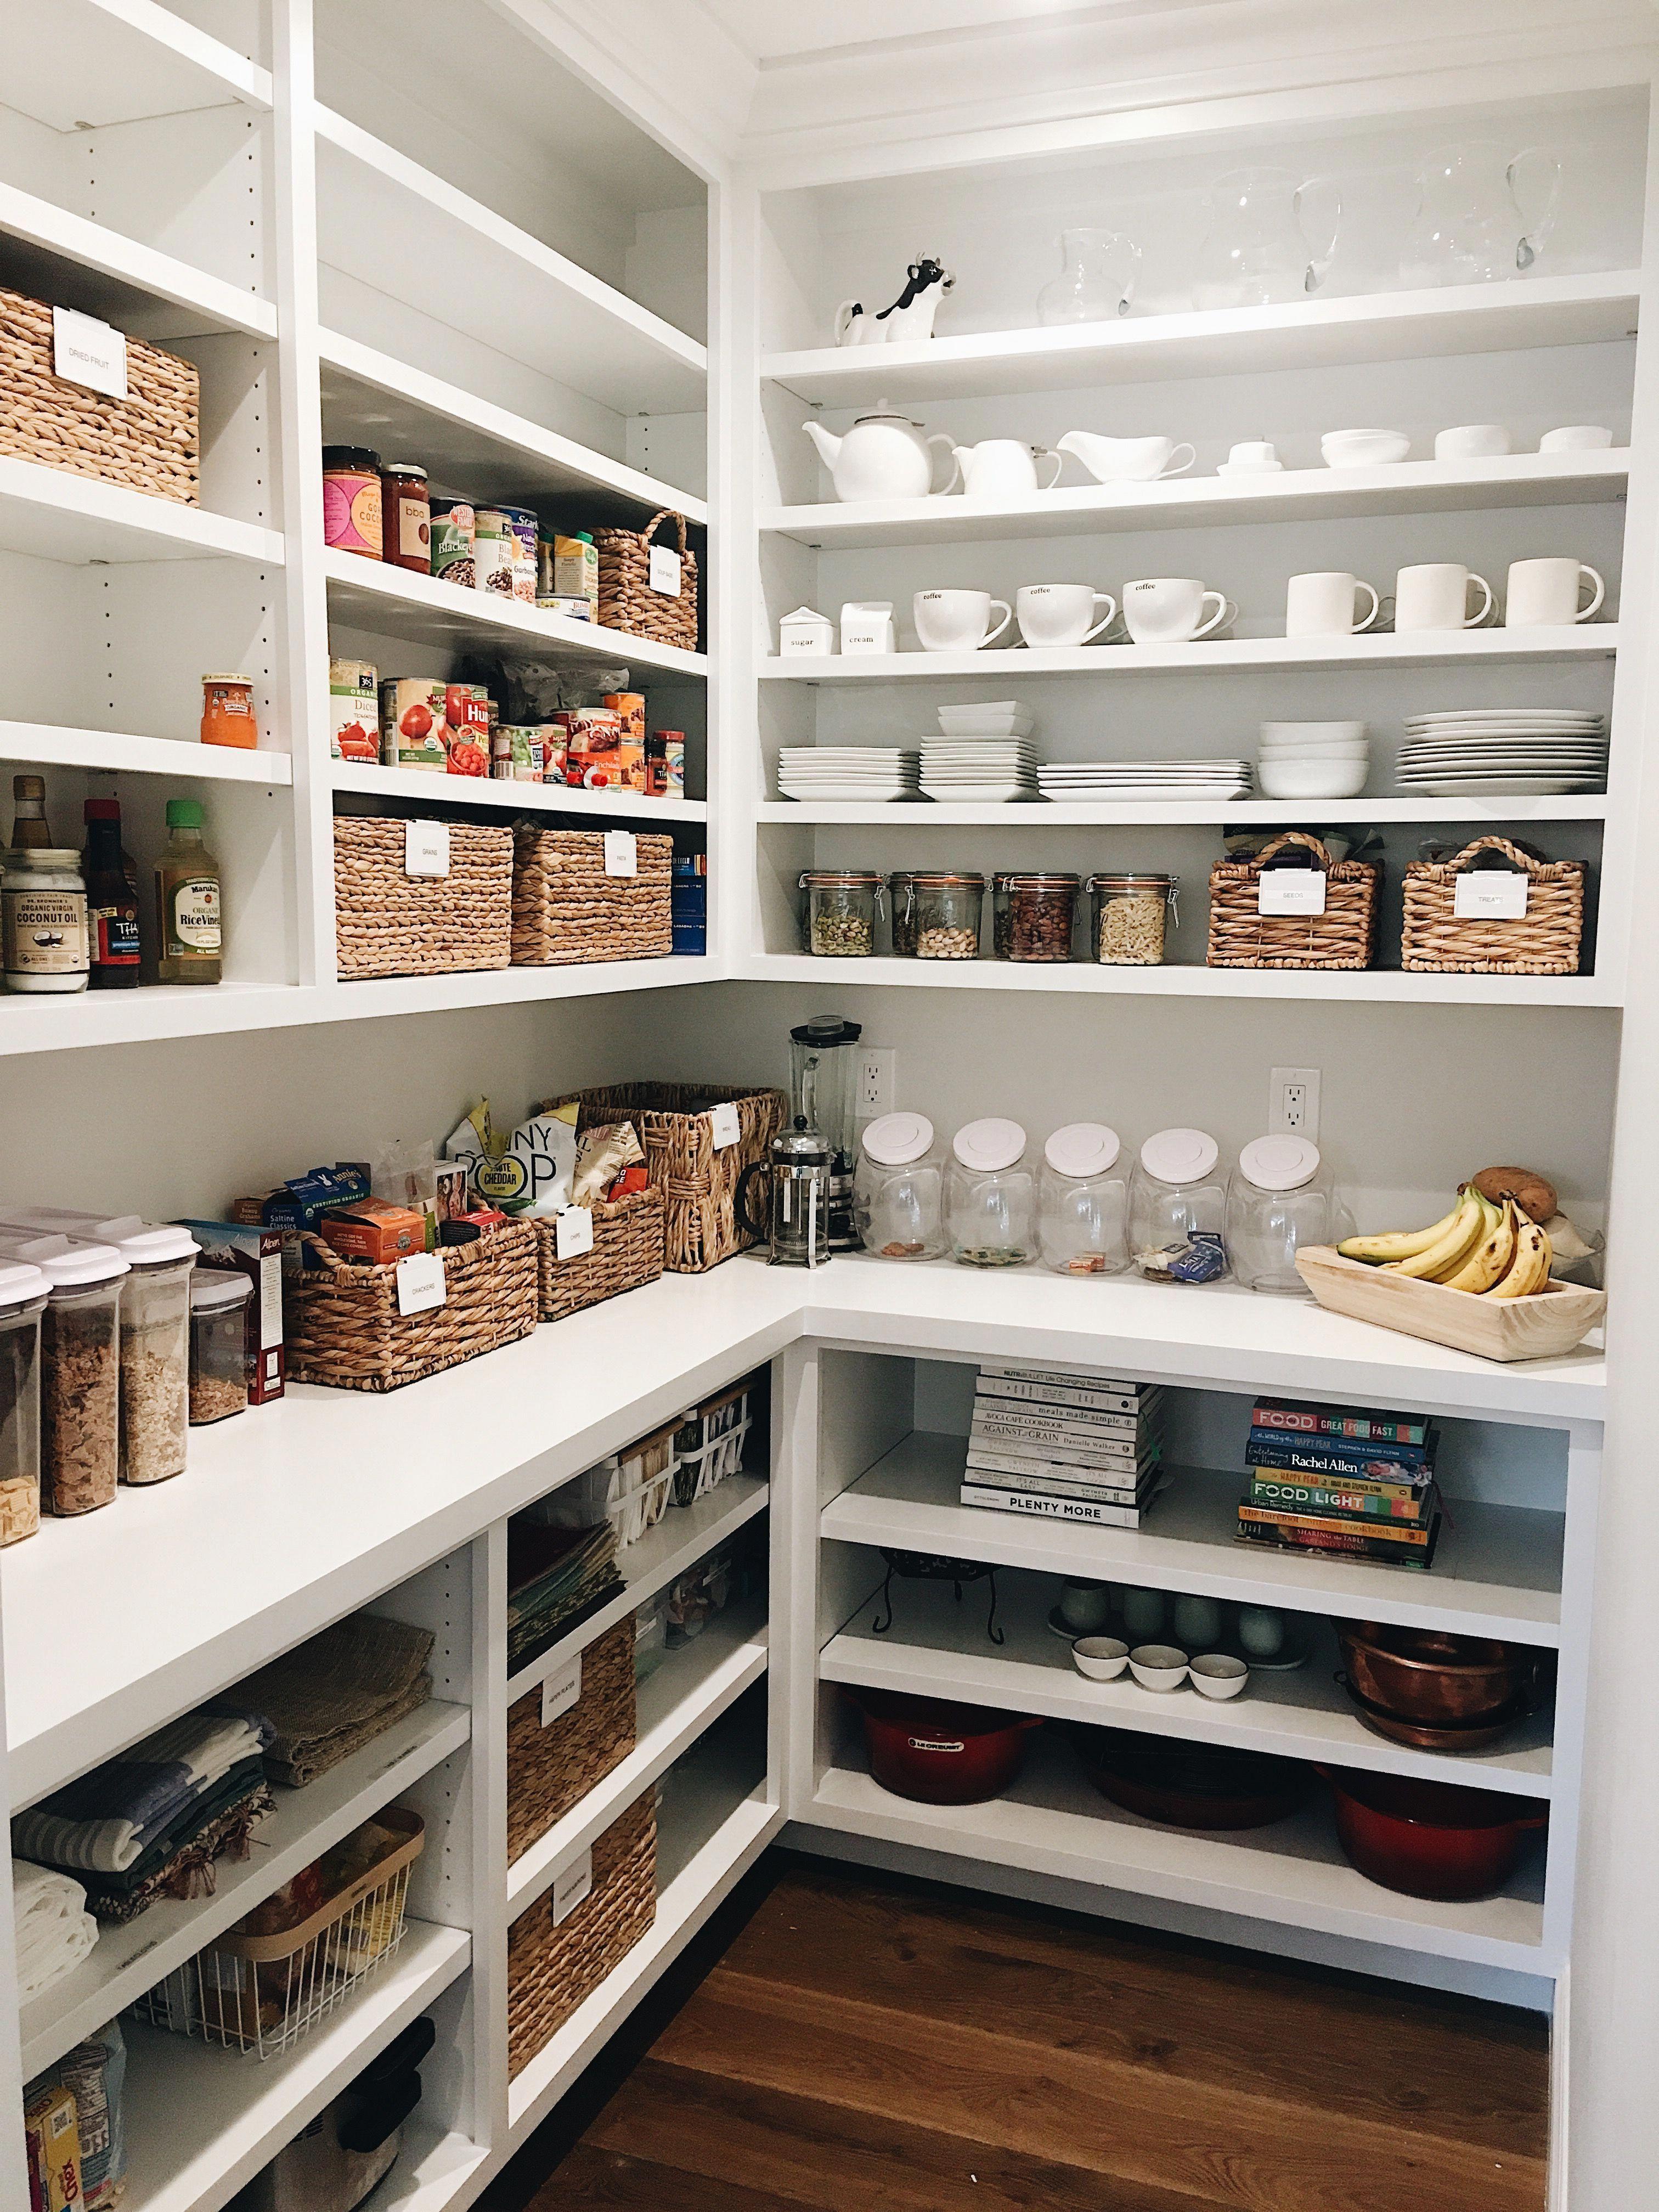 35 Fresh White Kitchen Ideas to Brighten Your